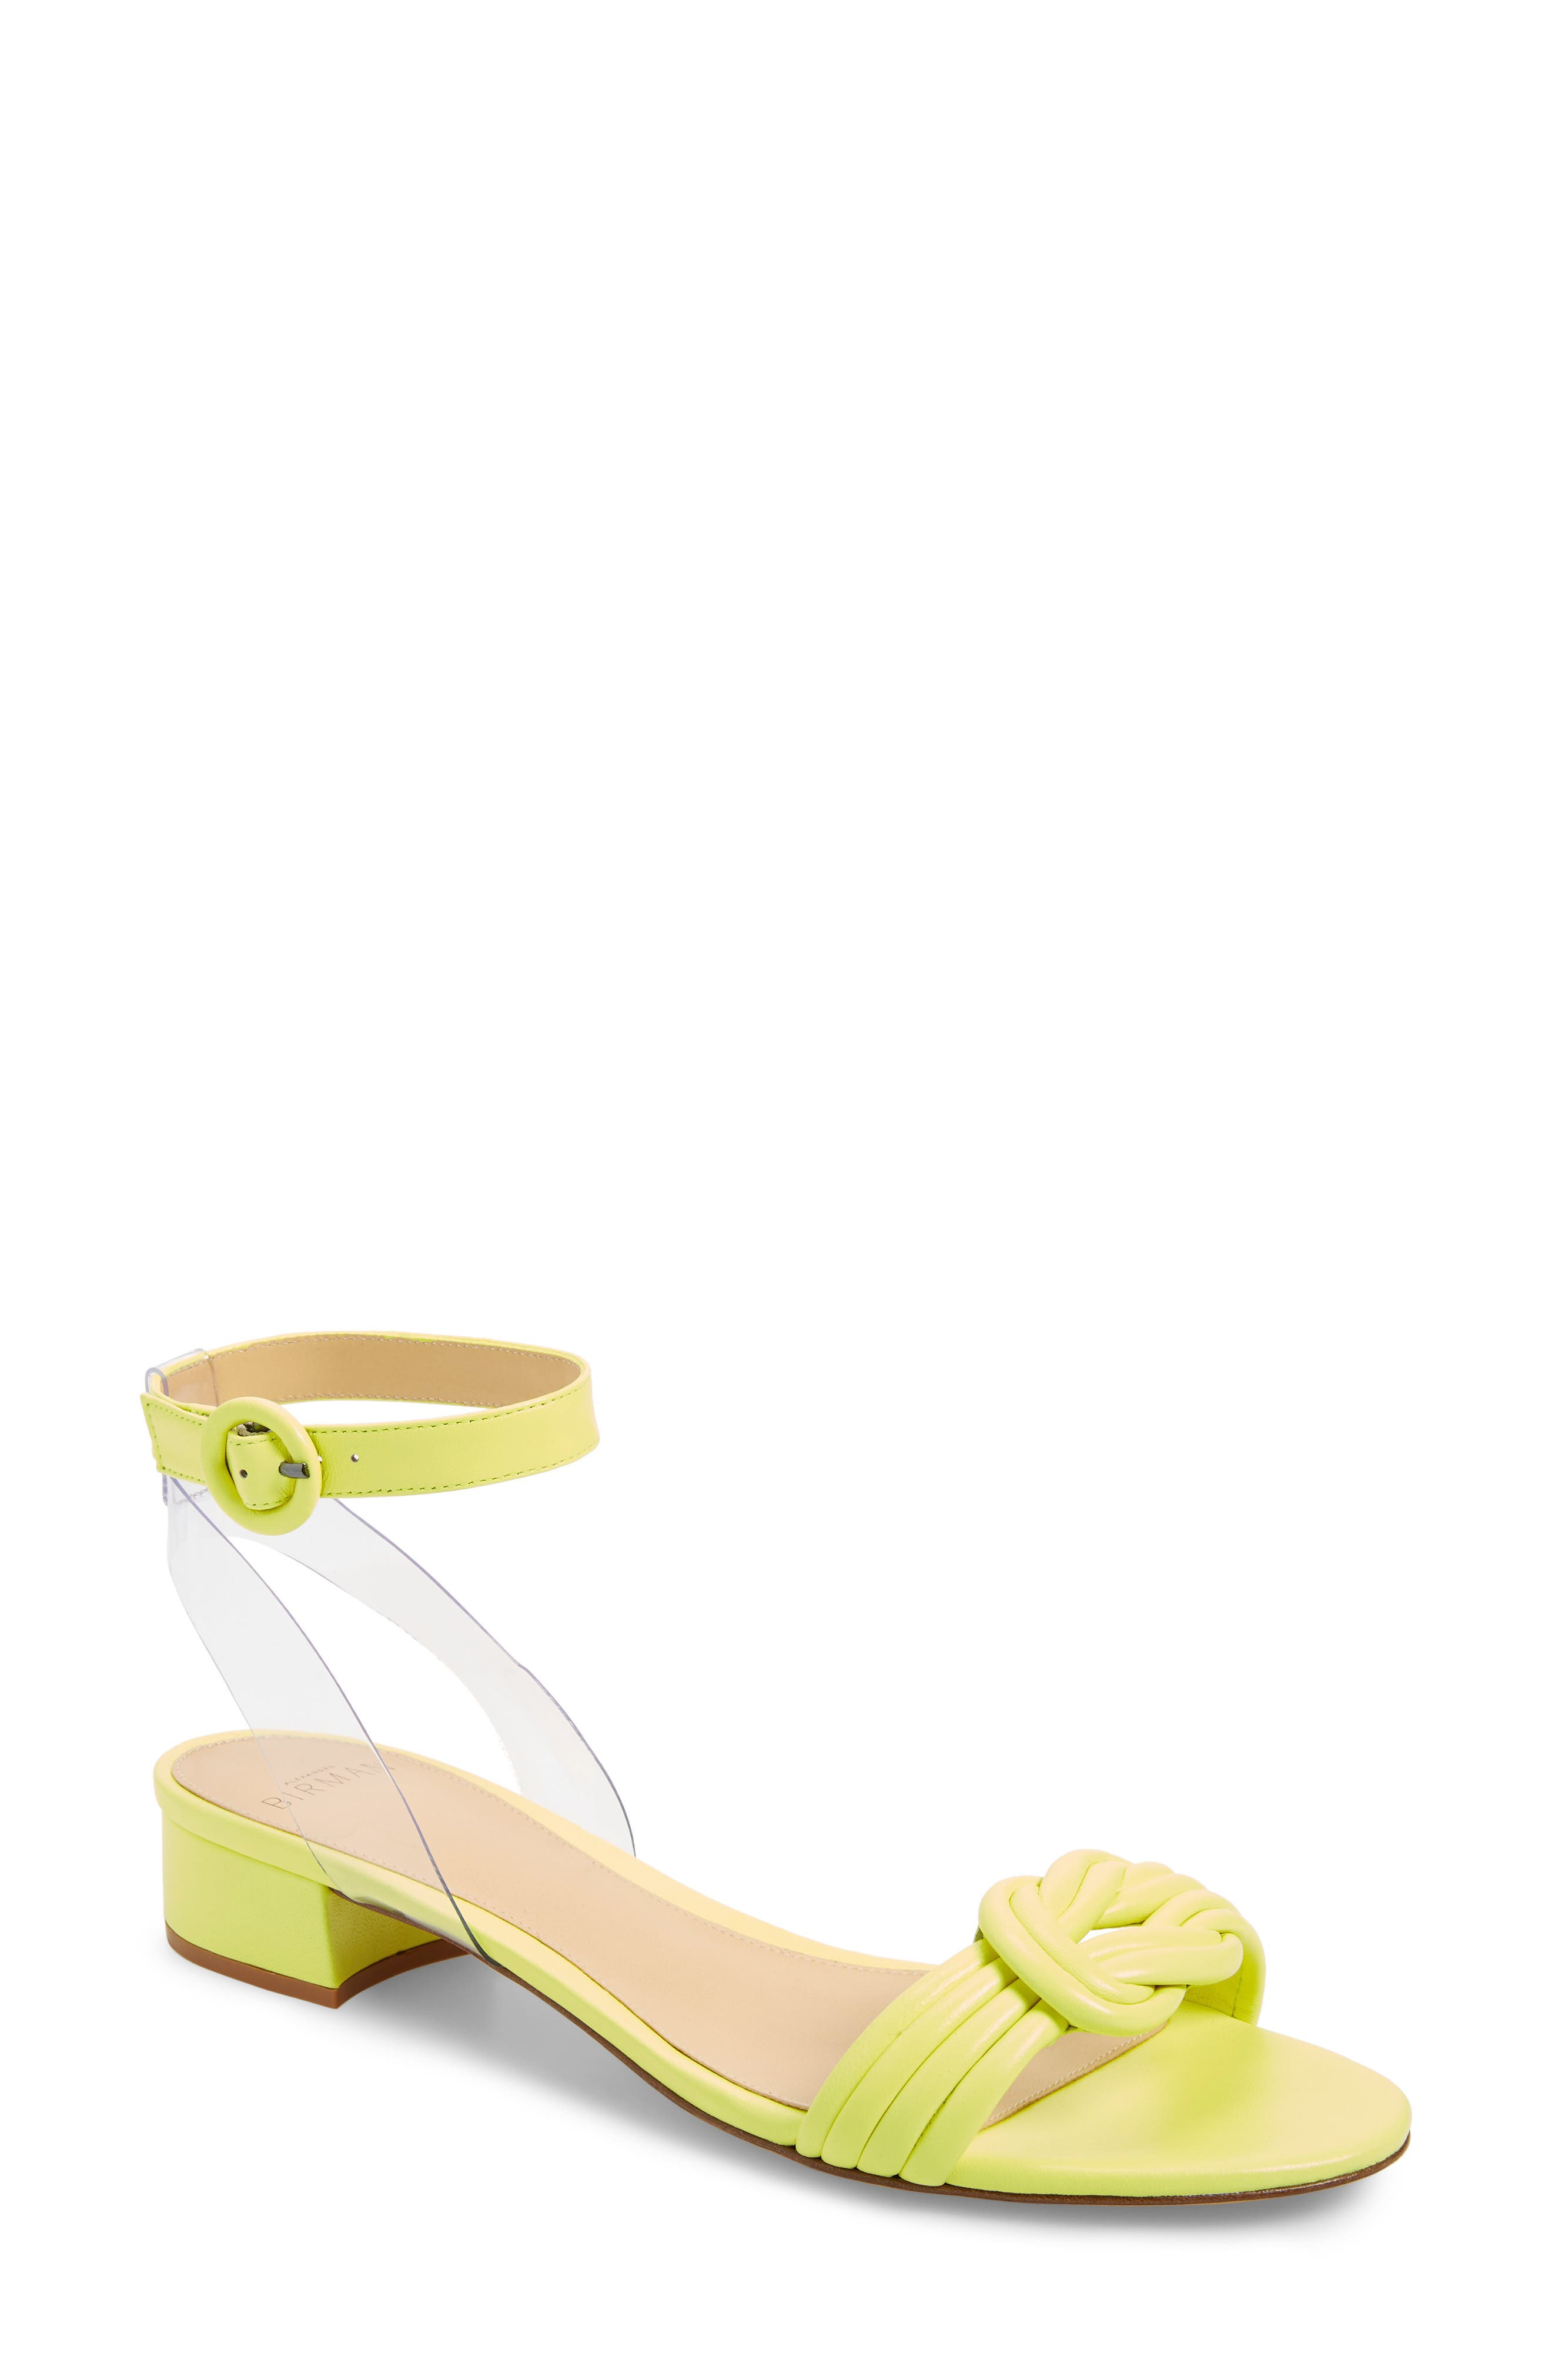 Alexandre Birman Vicky Ankle Strap Sandal - Yellow